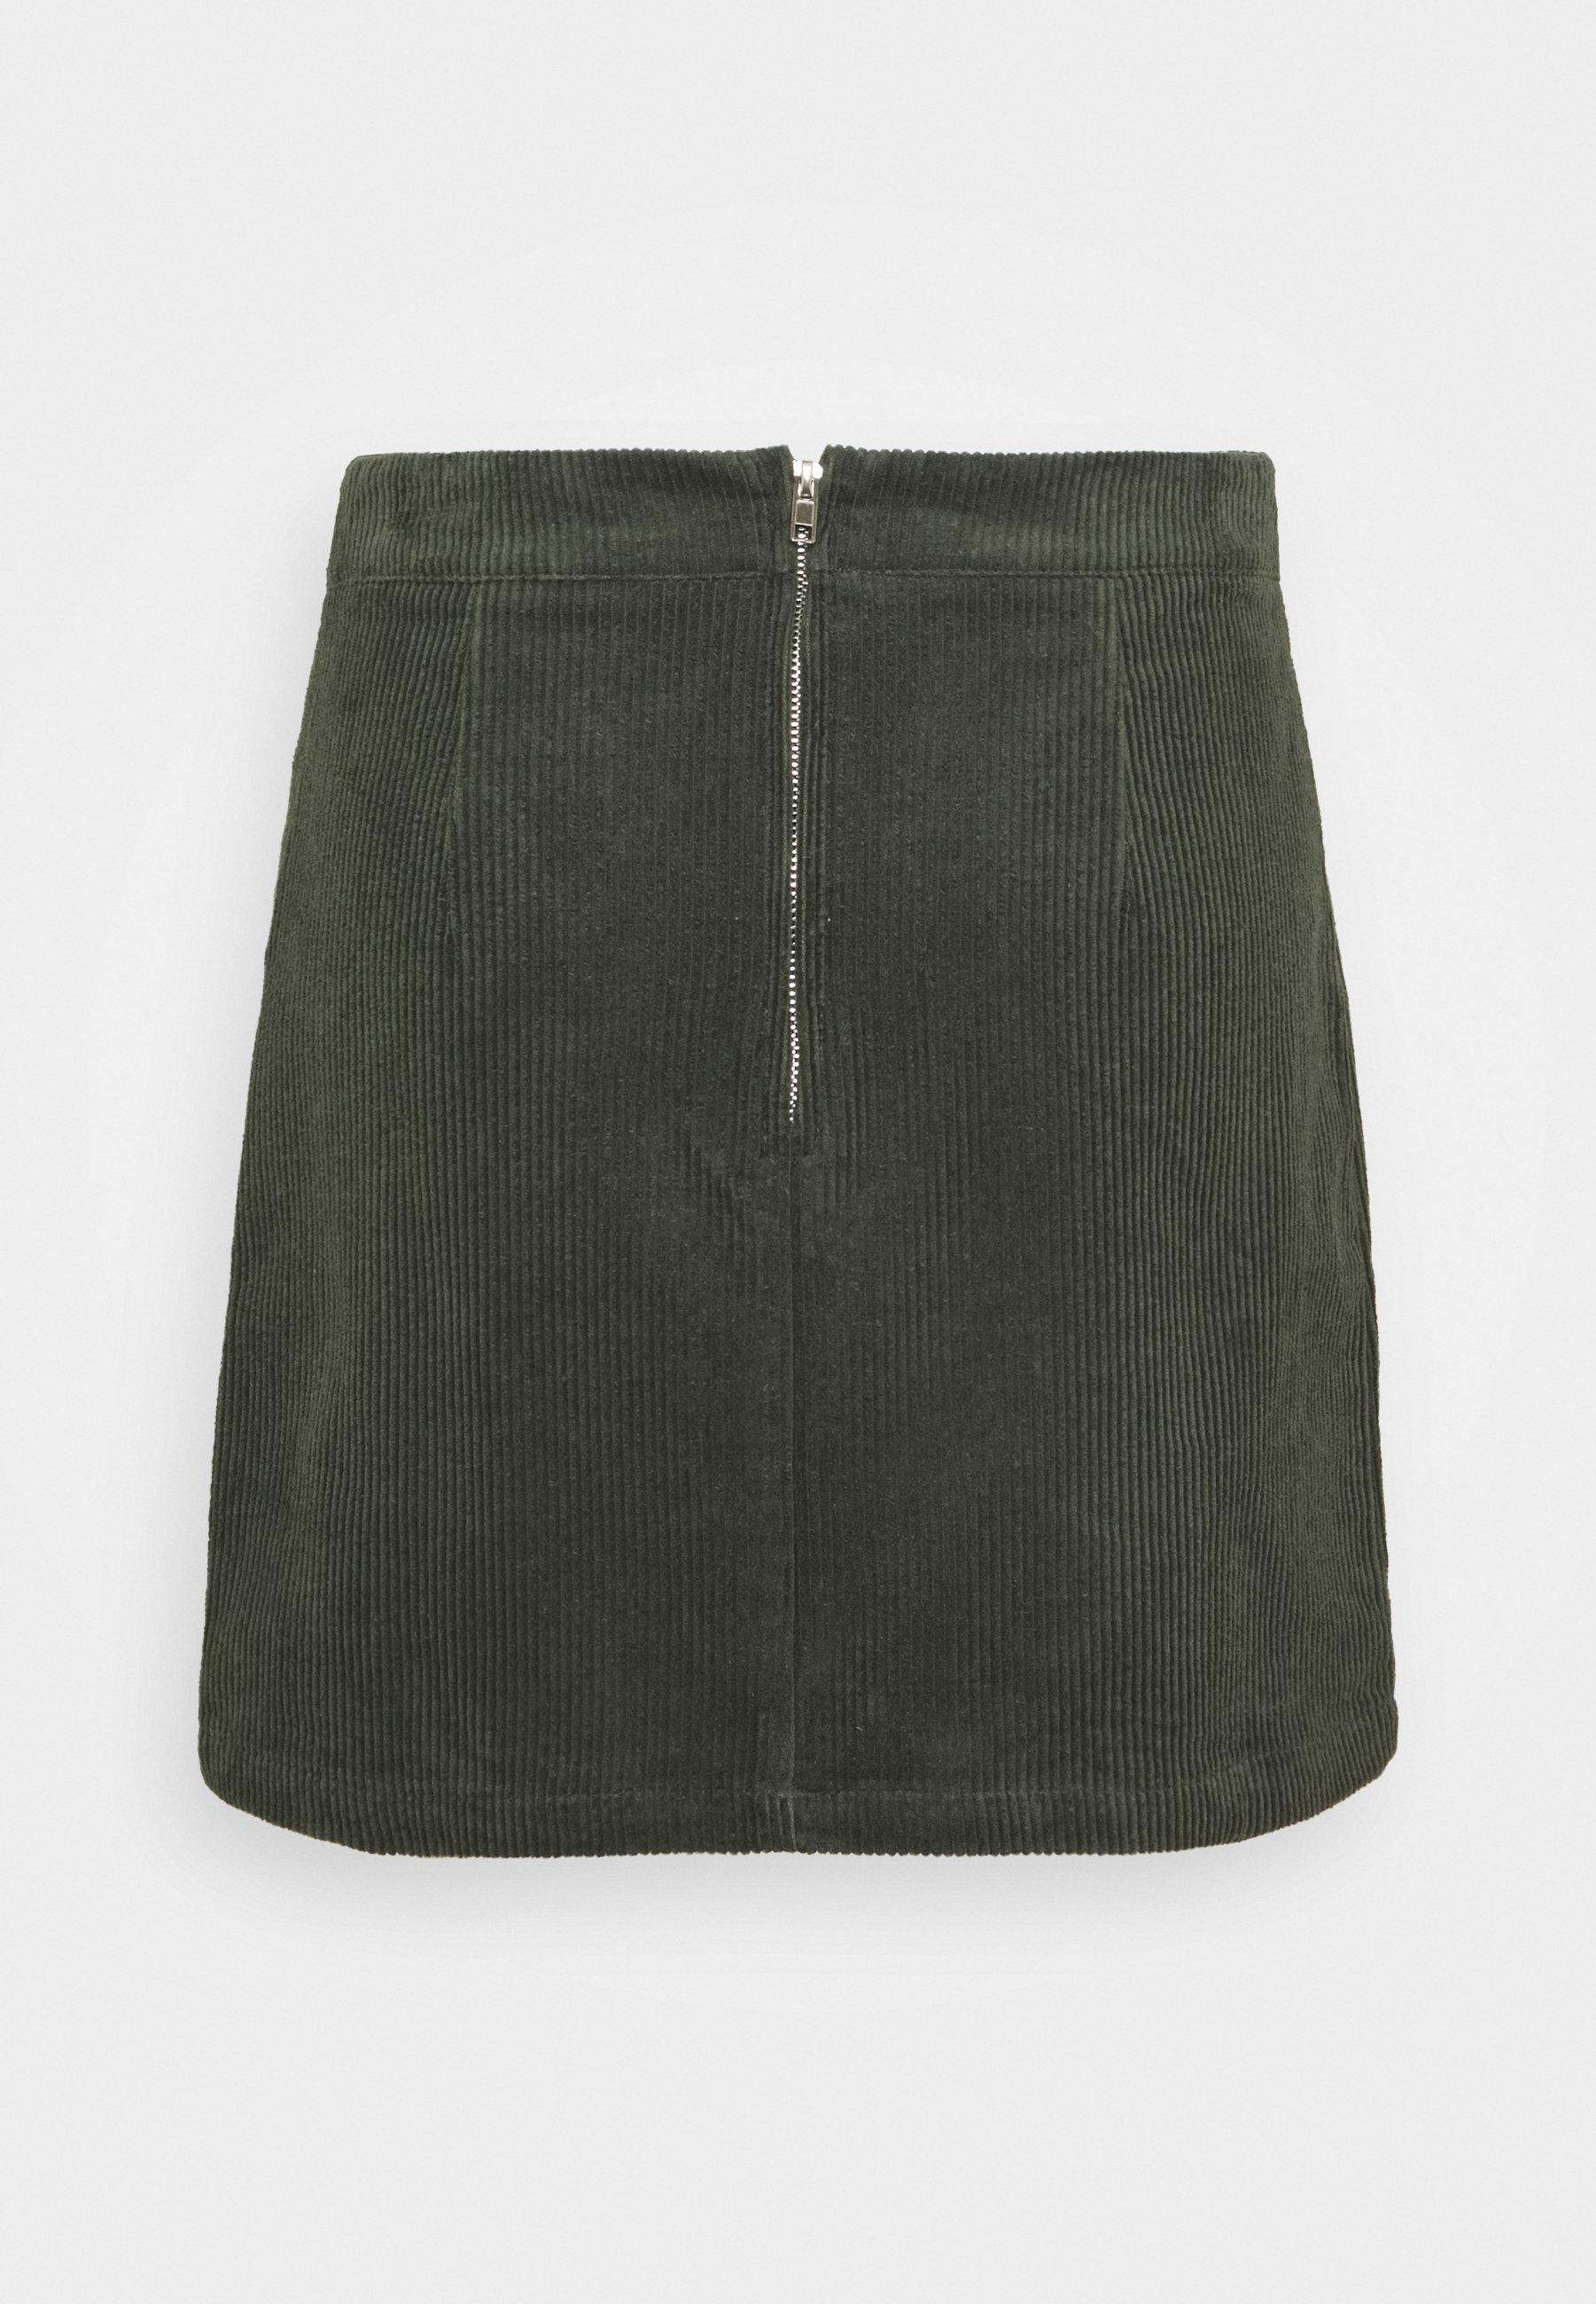 Femme MINI SKIRT - Minijupe - dark green